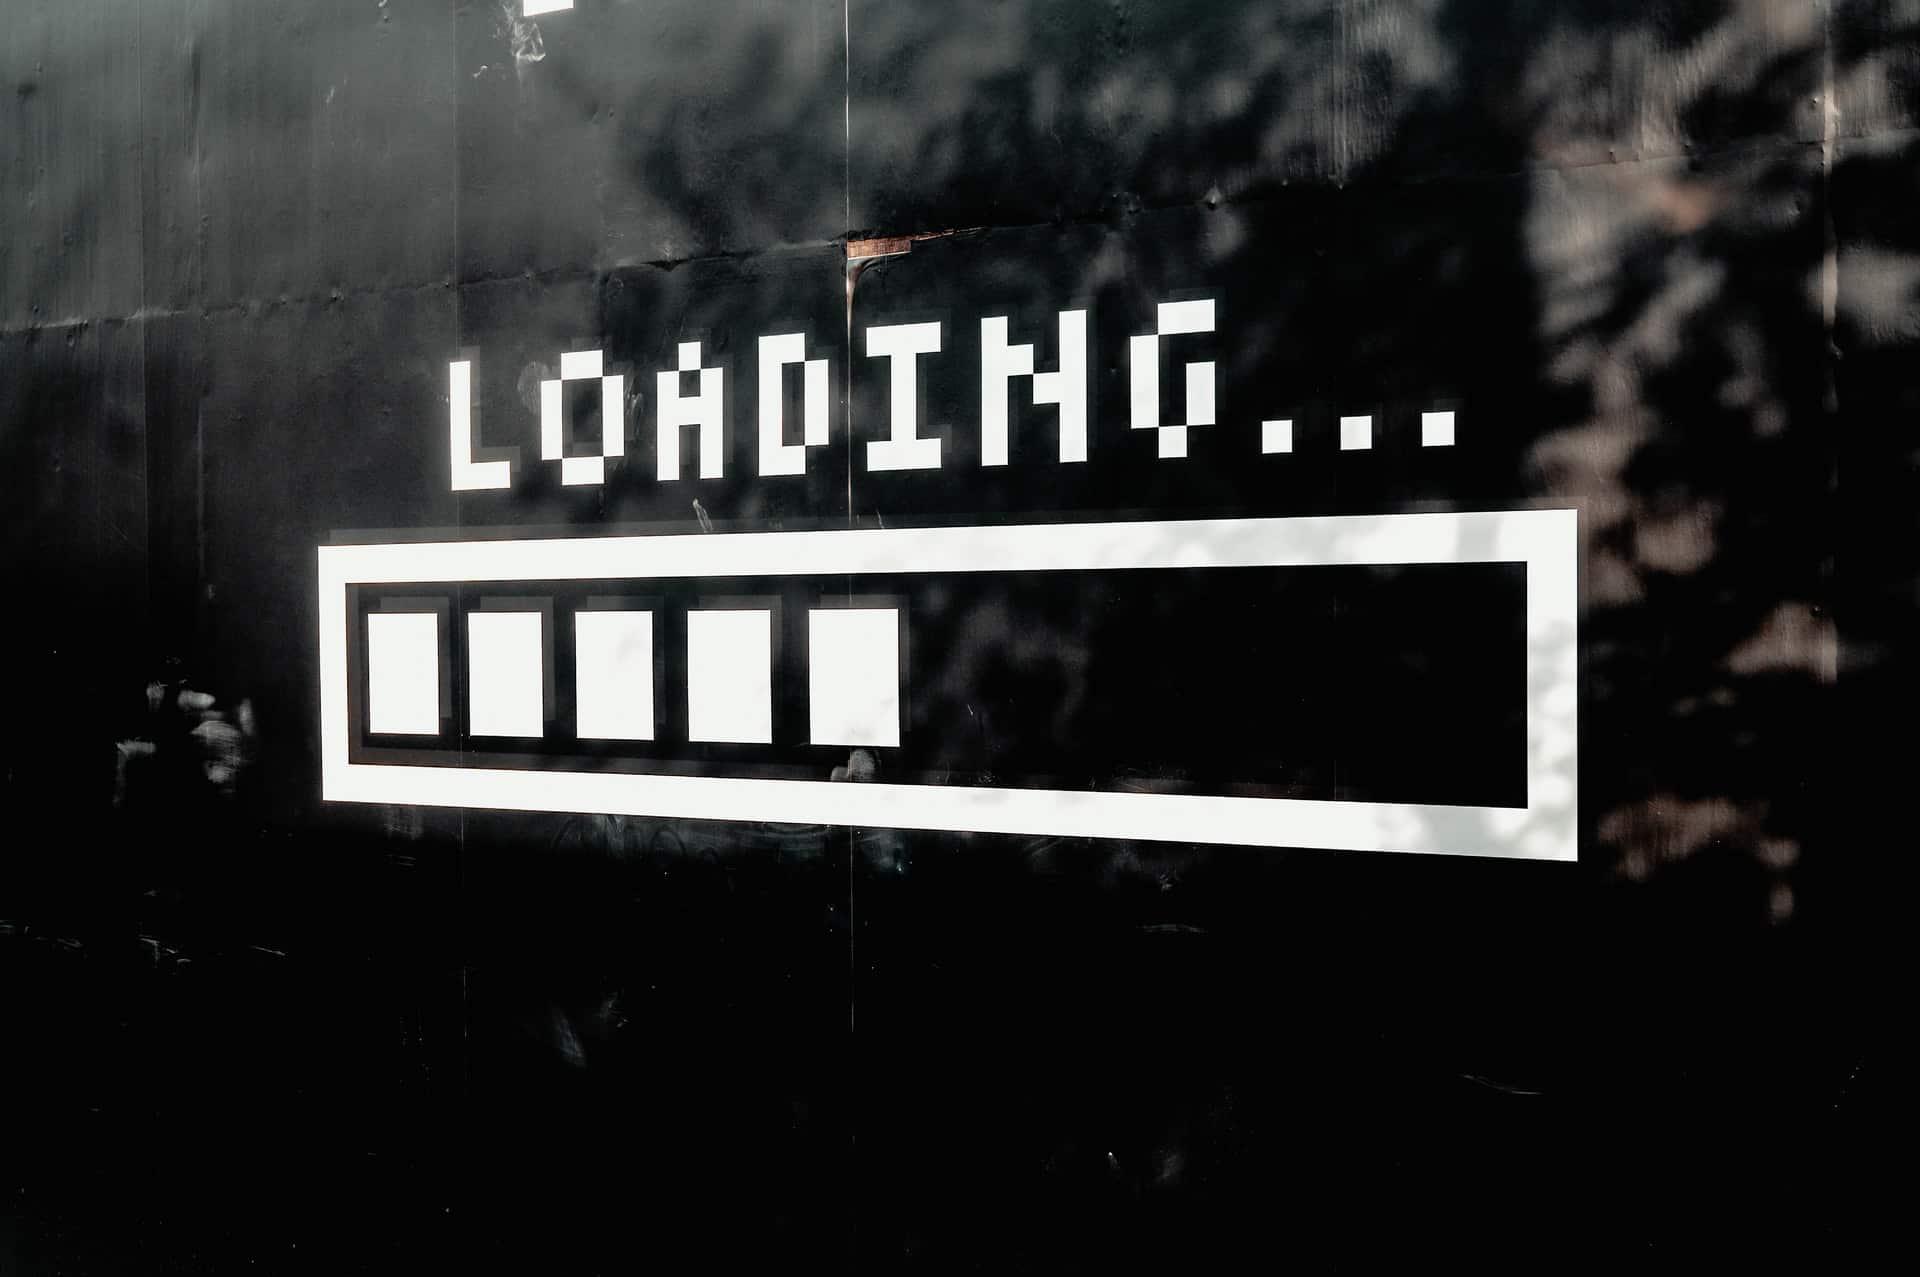 Loading sign